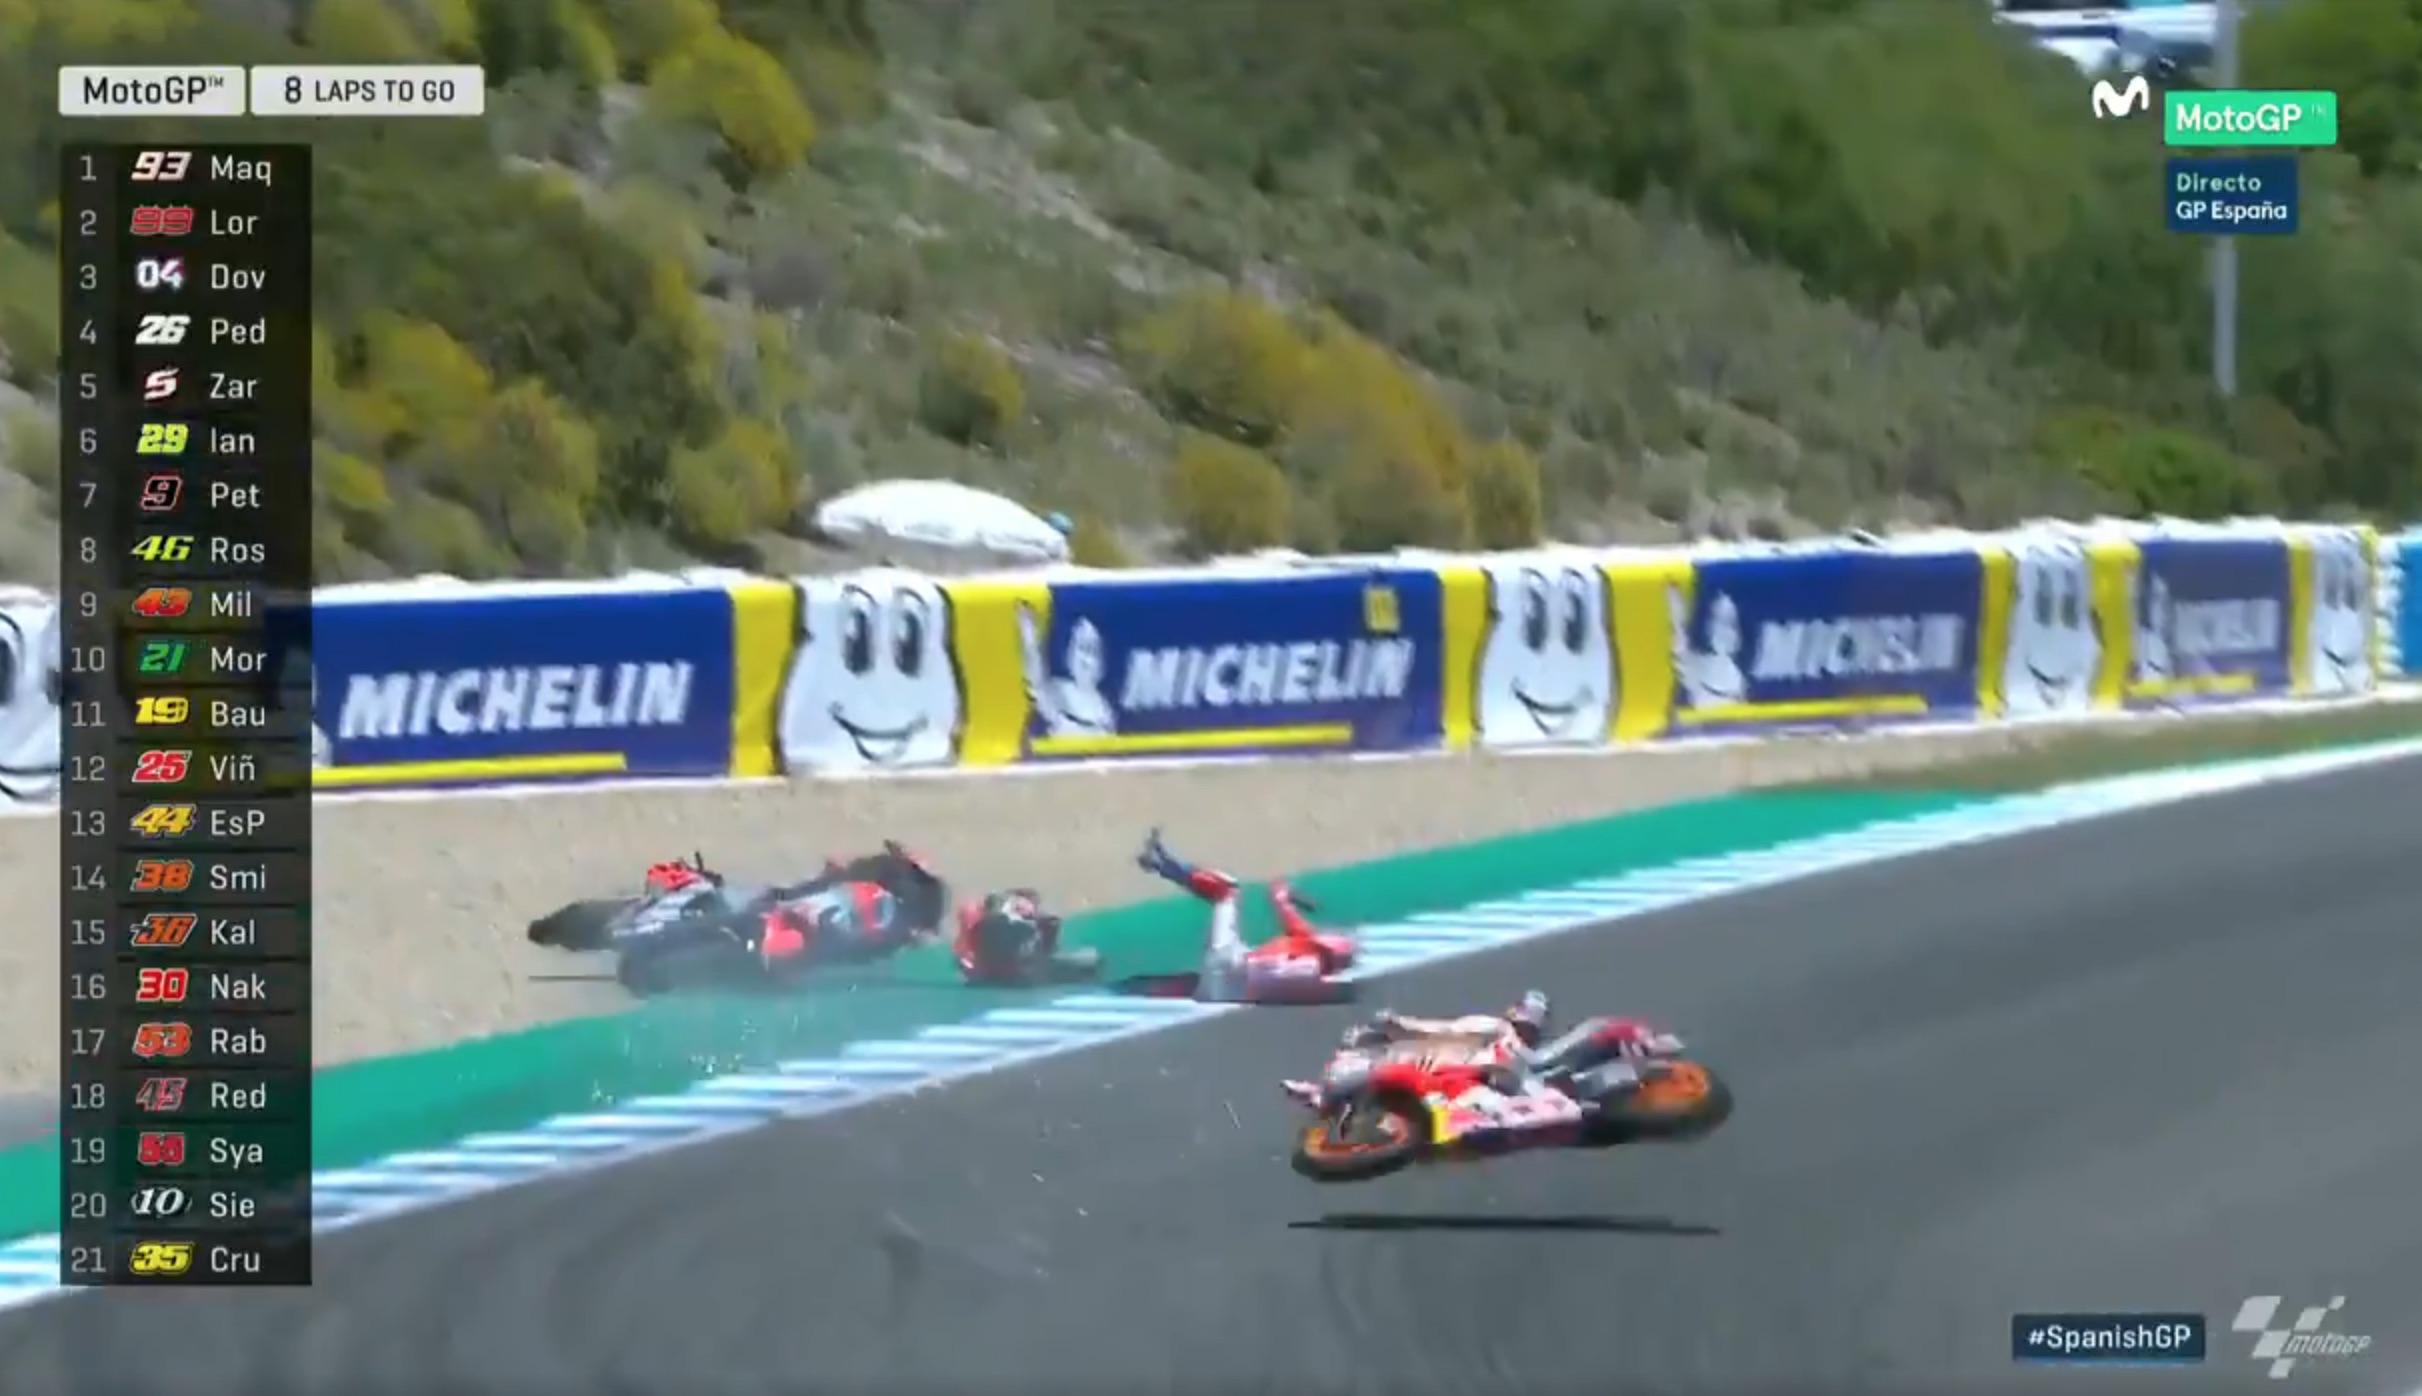 Así ha sido el incidente entre Jorge Lorenzo, Dani Pedrosa y Andrea Dovizioso